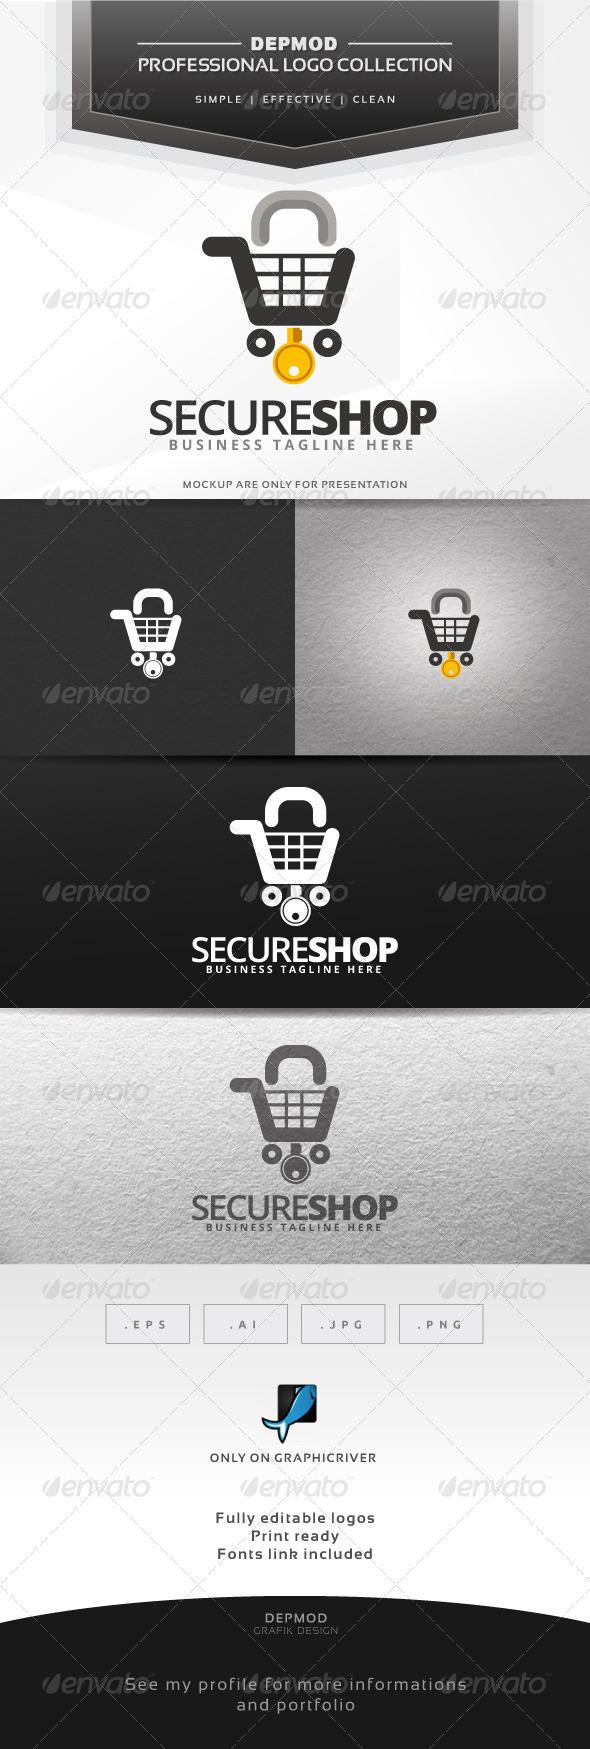 Logotipo para Compras Online Seguras.